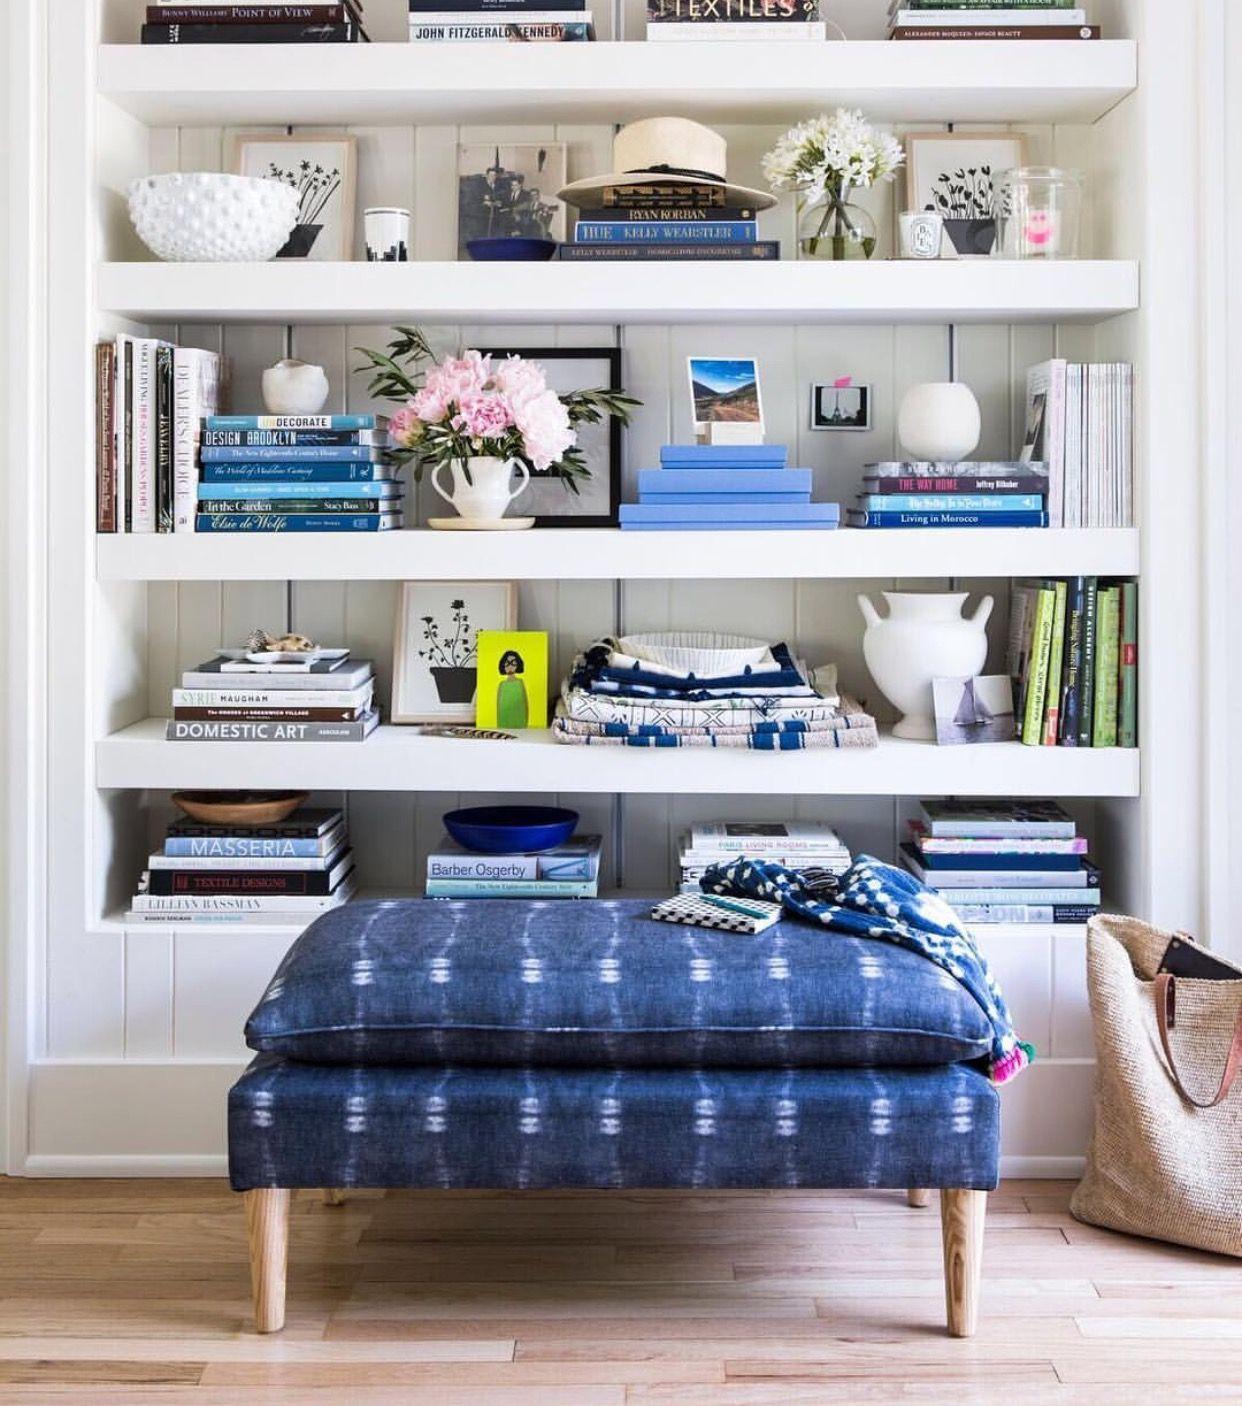 hacks watch how bench storage a home turn into to youtube bookshelf